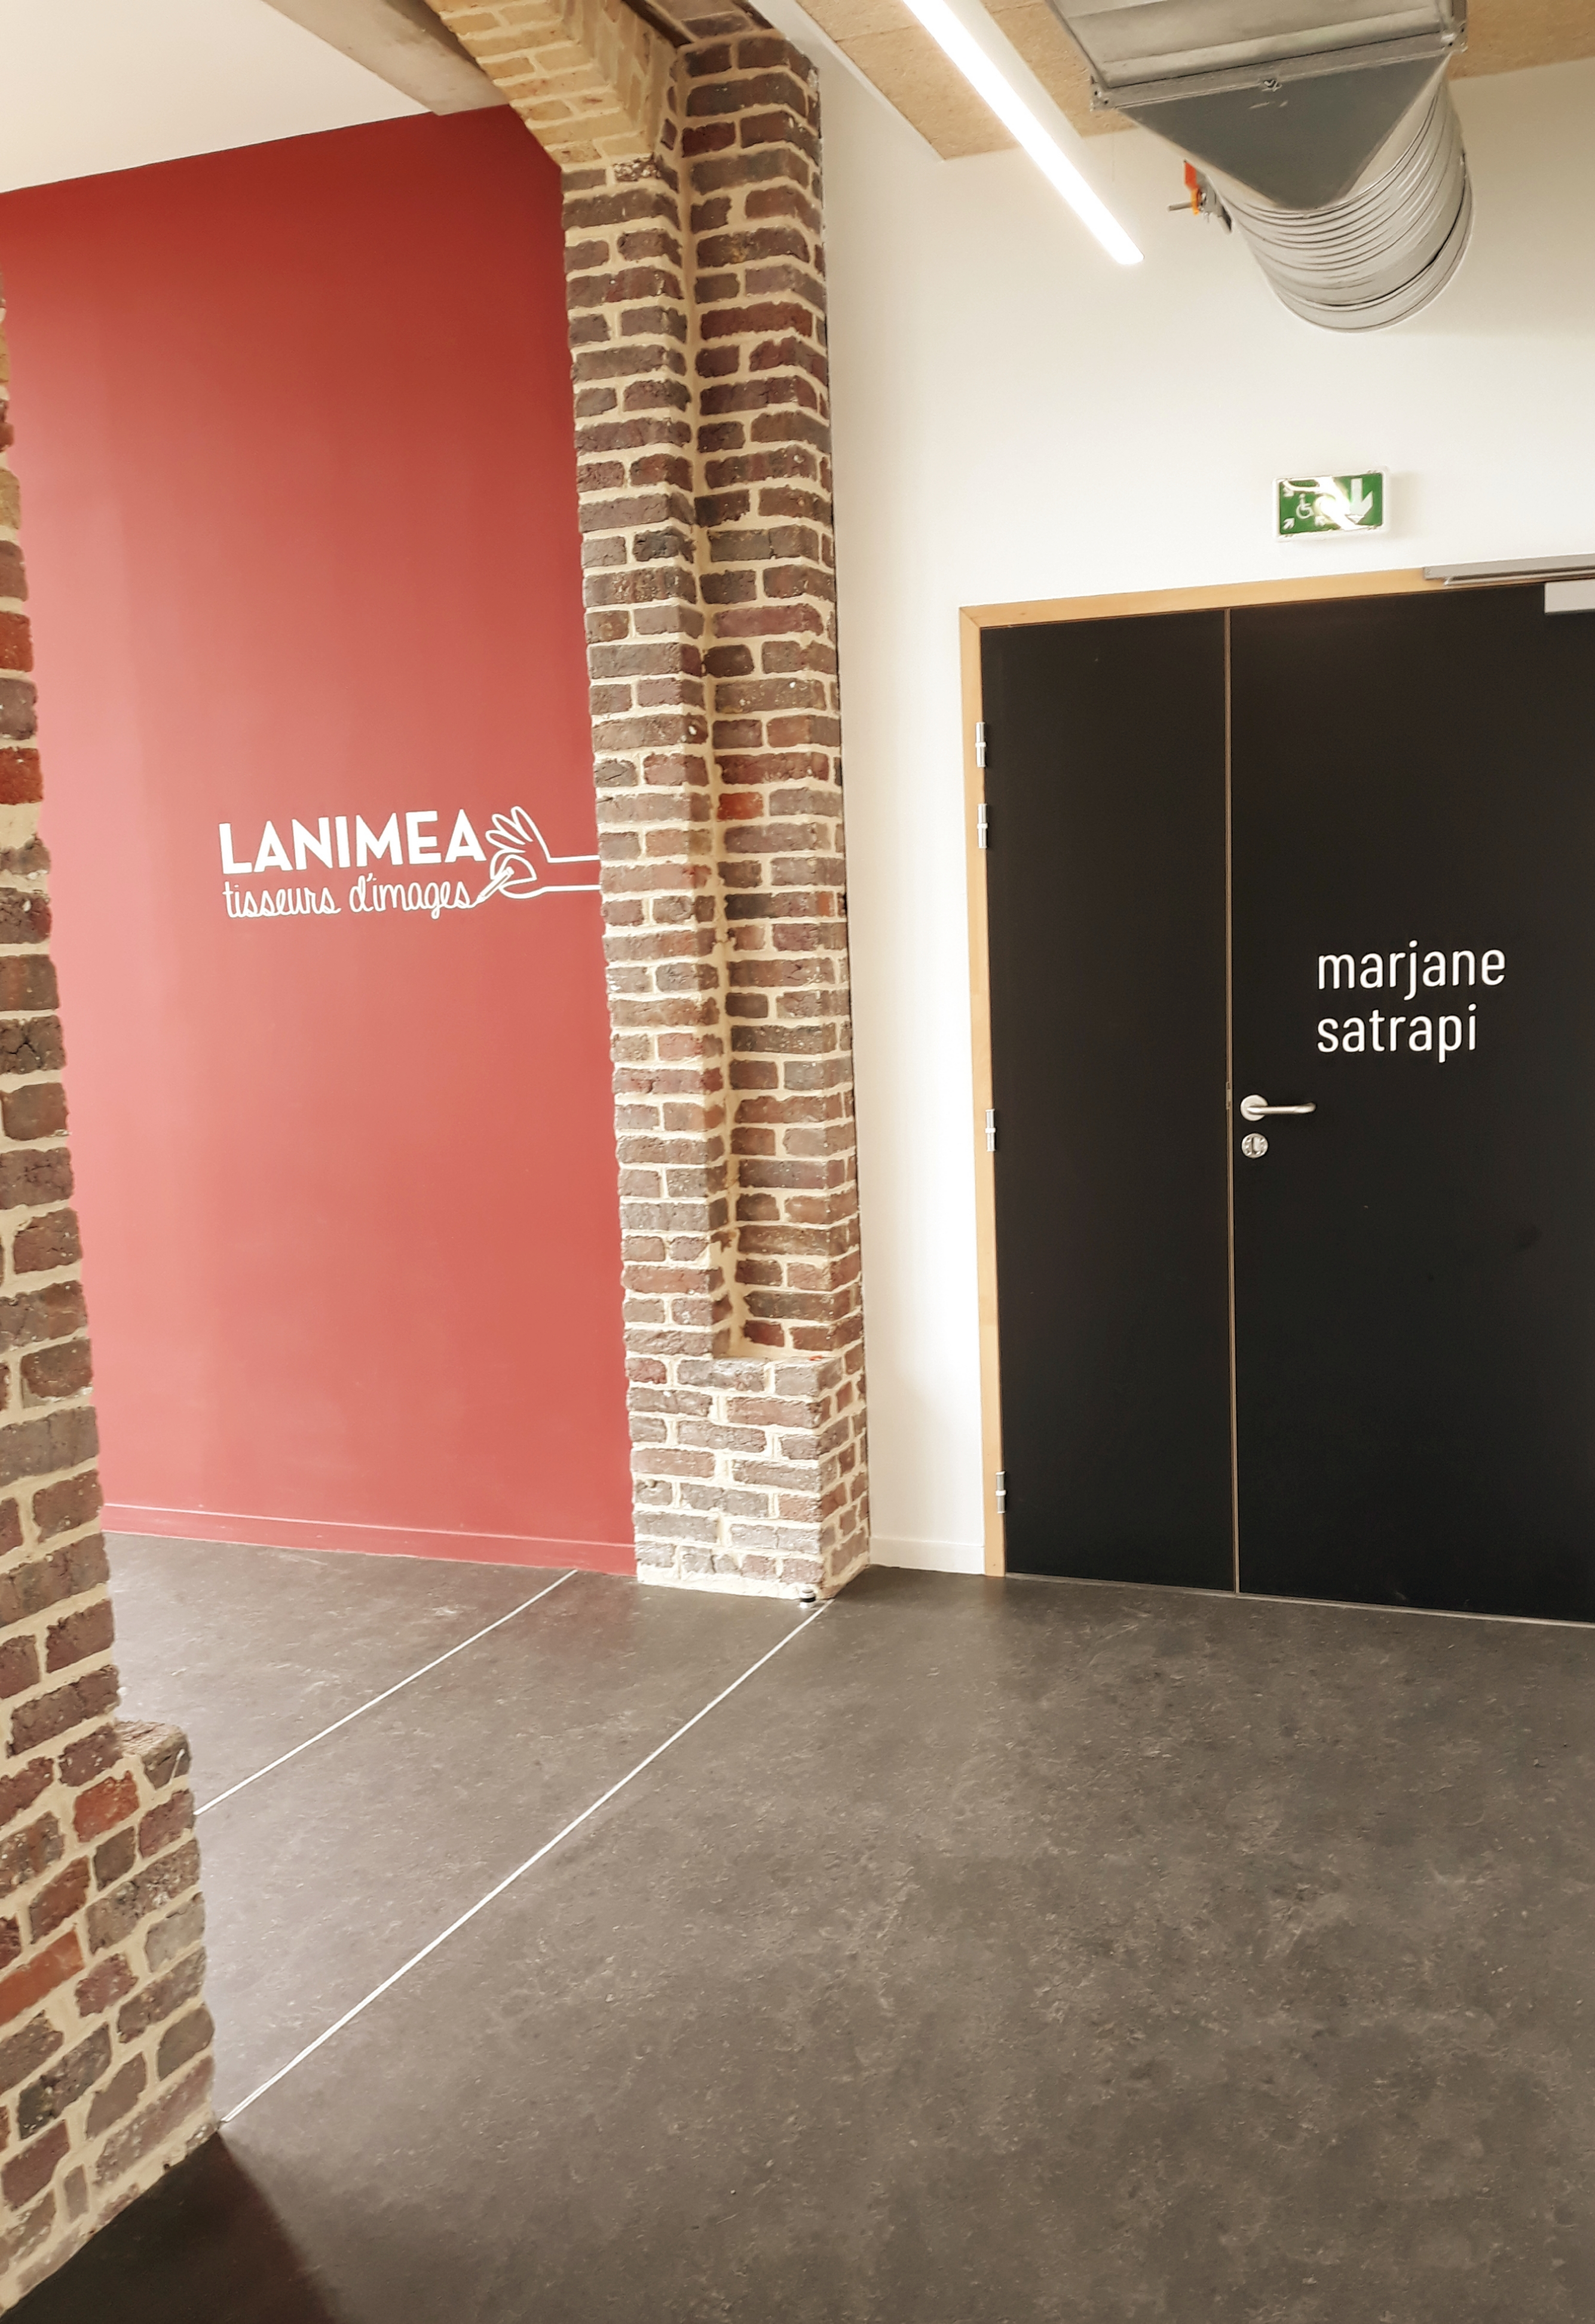 Lanimea-ÉCOLE-tablette-wacom